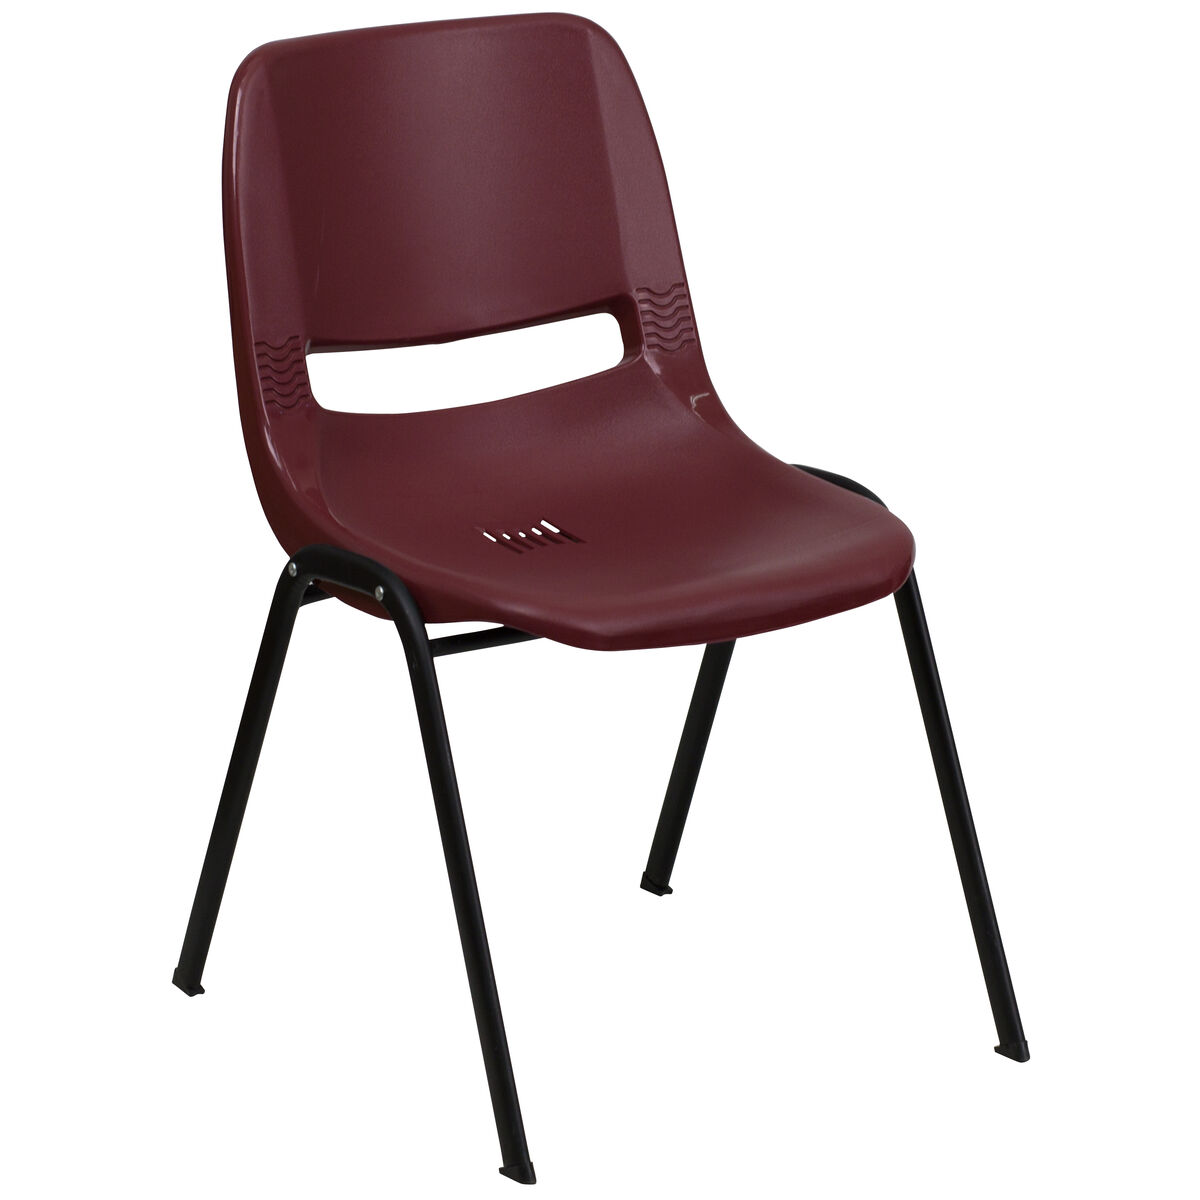 Burgundy Plastic Stack Chair Rut Eo1 By Gg Bizchair Com